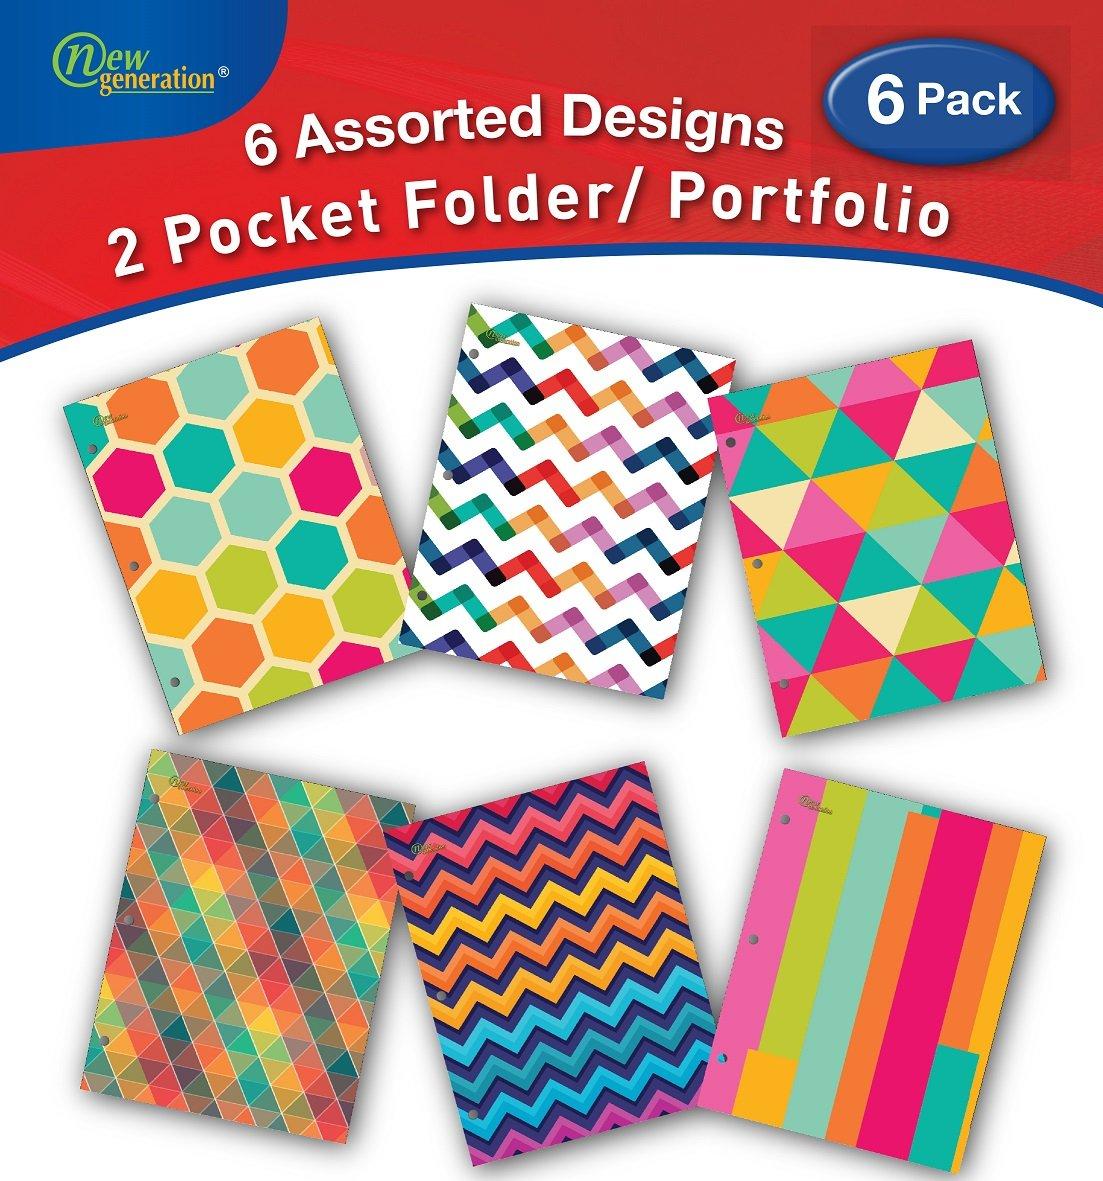 New Generation - Pattern - 2 Pocket Folder/Portfolio 6 Pack, 3 Hole Punch 6 Fashionable Designs,UV Laminated Folders, Back to School/Campus Supply. (6 Pack FOLDERS)